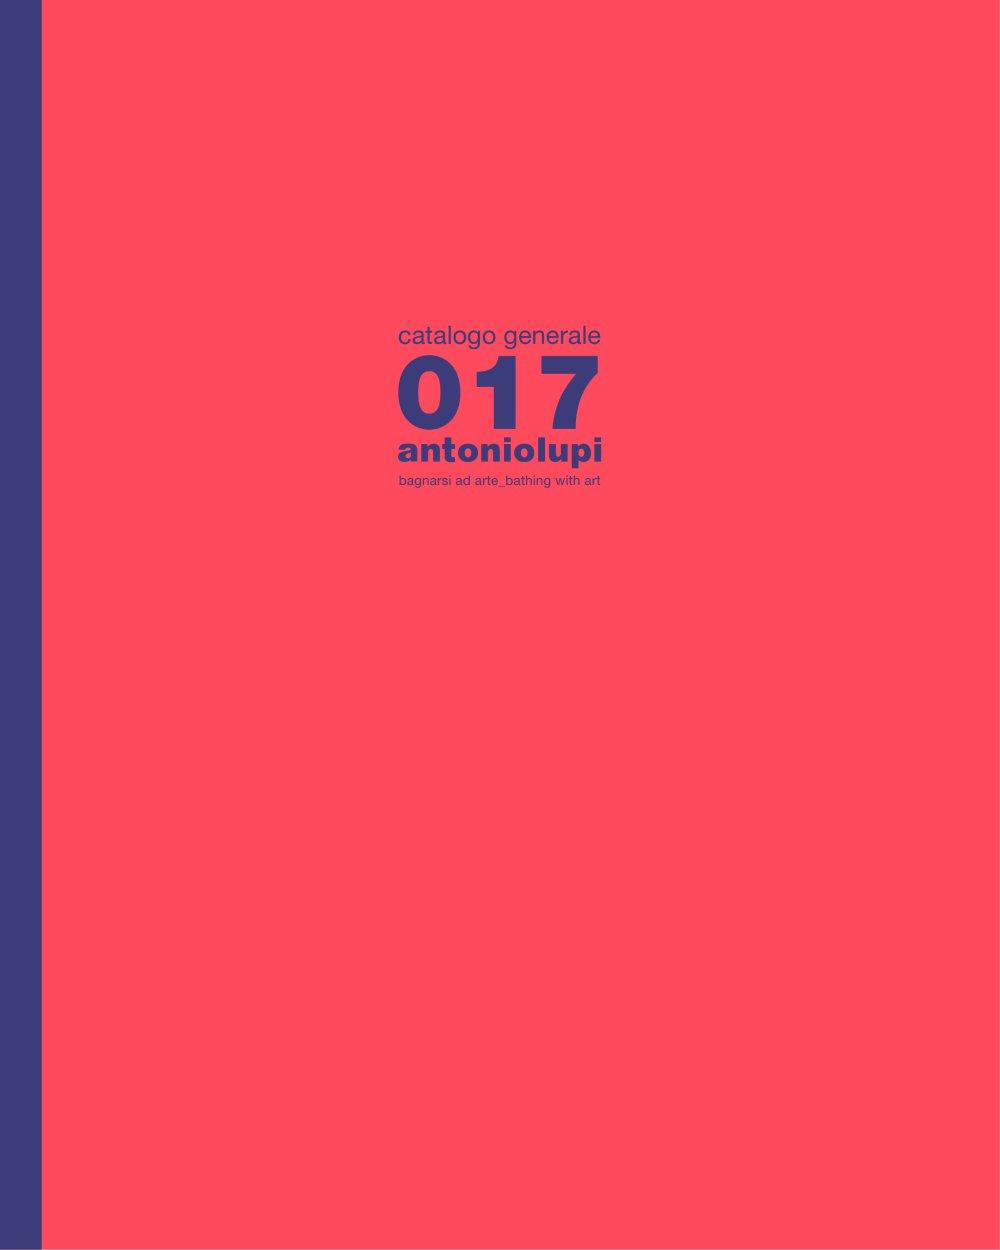 Catalogo generale 2017 - ANTONIO LUPI - Catalogo PDF ...